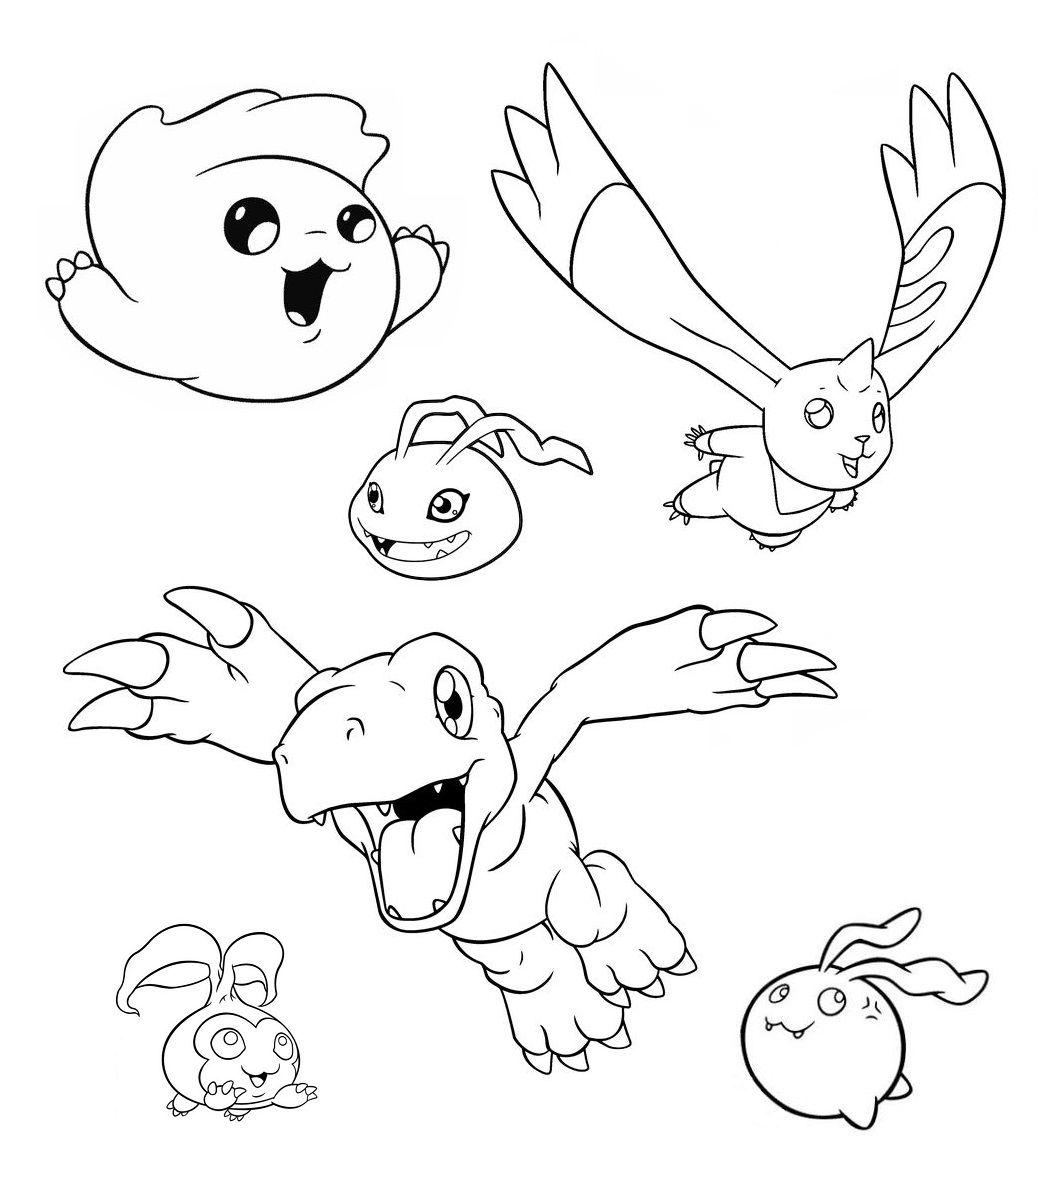 Digimon - coloring page | Coloring Pages | Pinterest | Digimon, Dbz ...